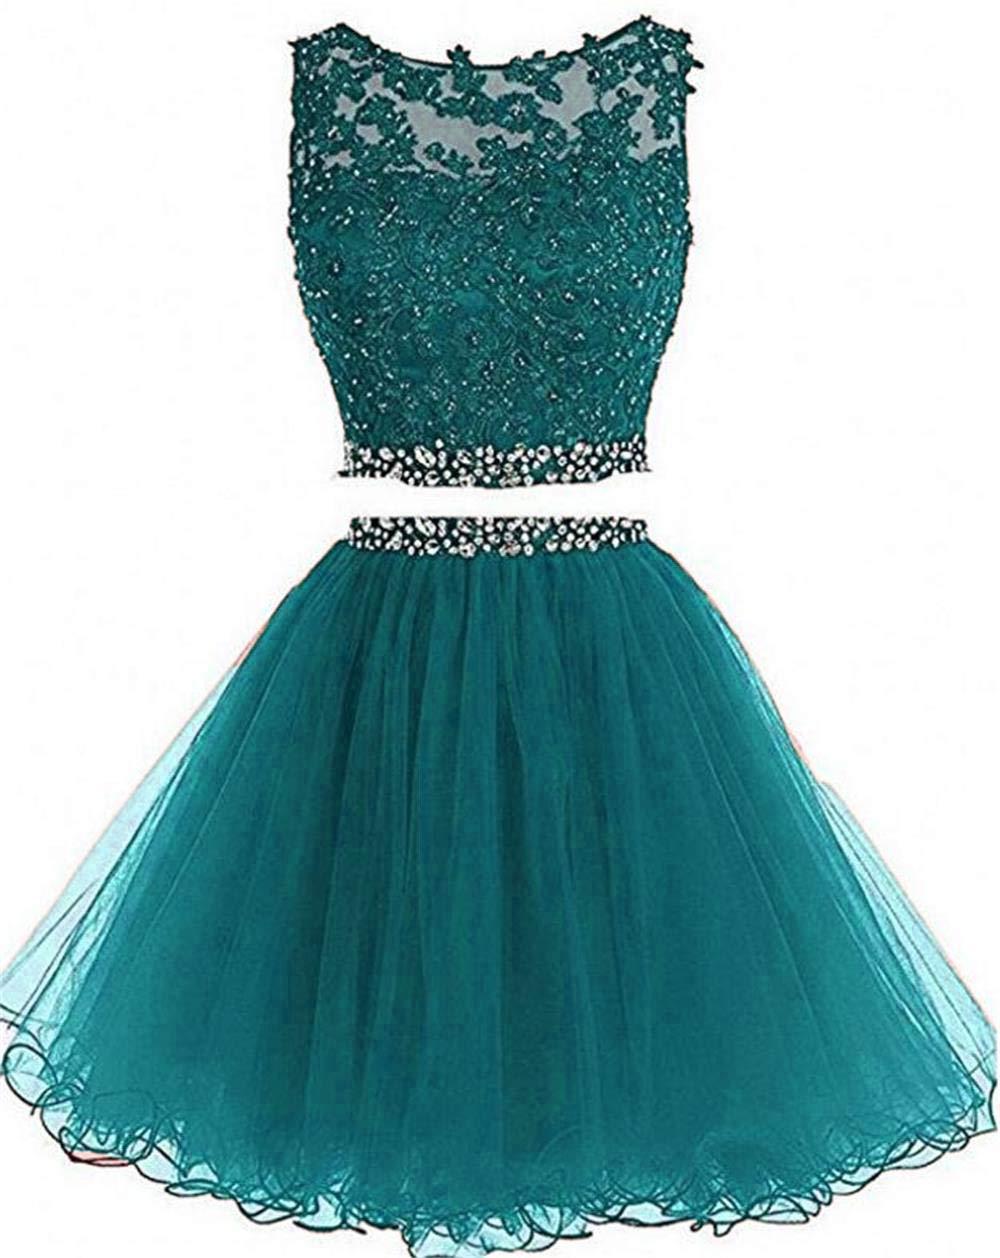 Dydsz Short Prom Dress Homecoming Party Dresses